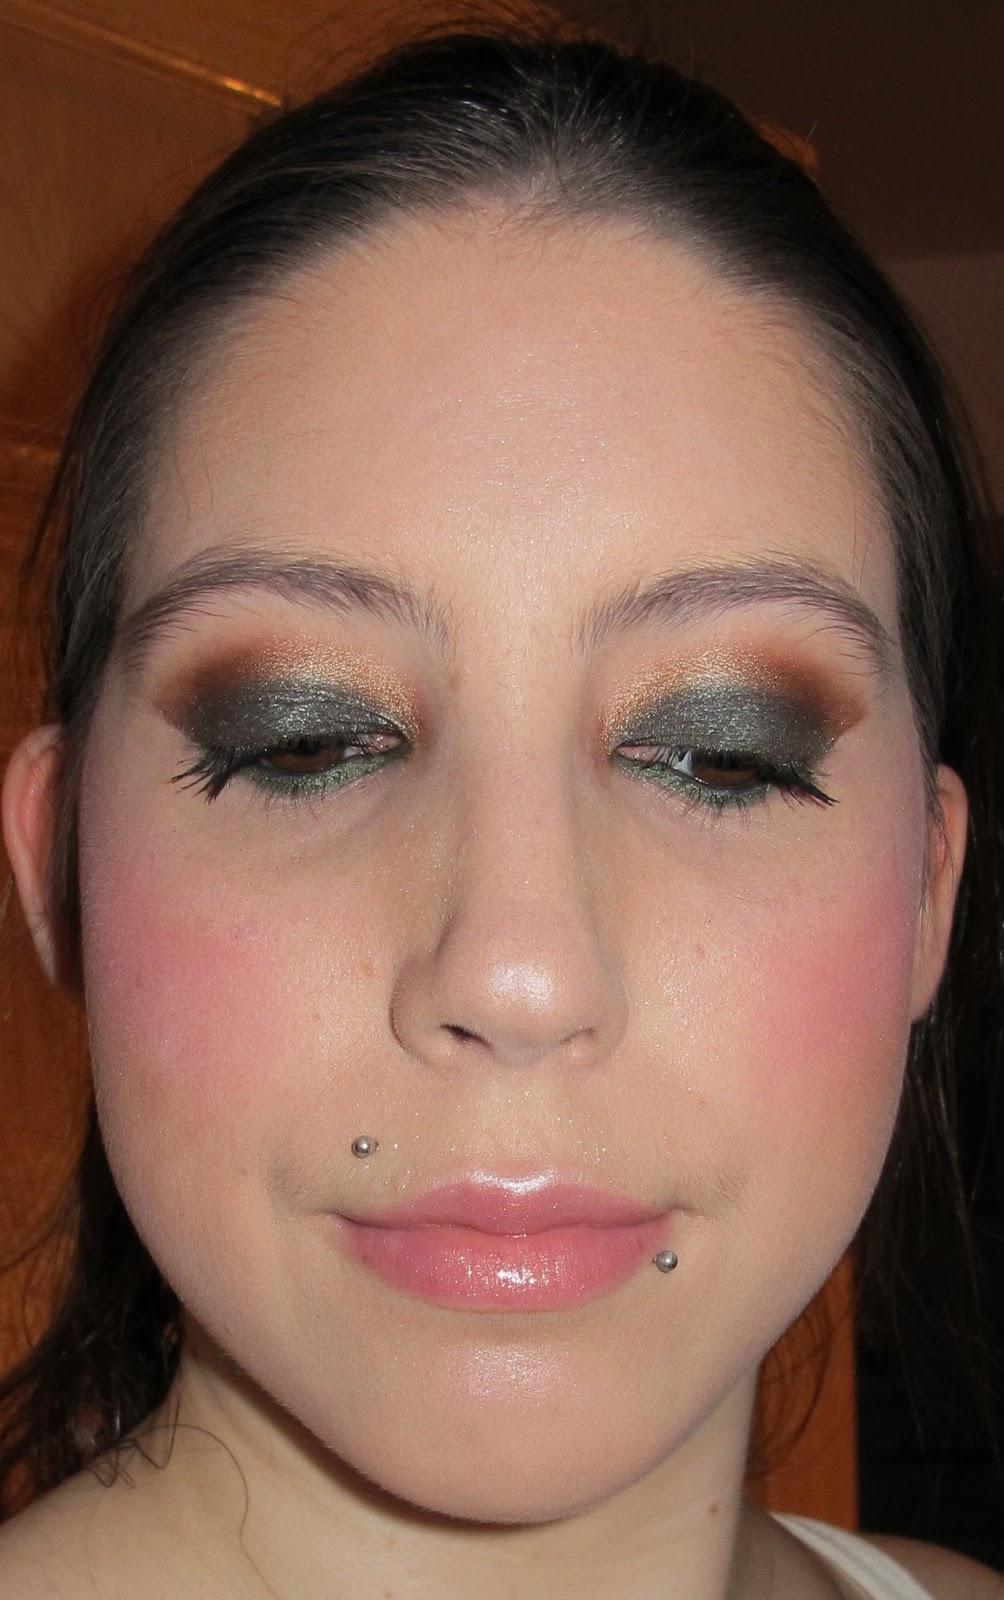 Steph Stud Makeup: MAC Club Eyeshadow Look And How To Wear It